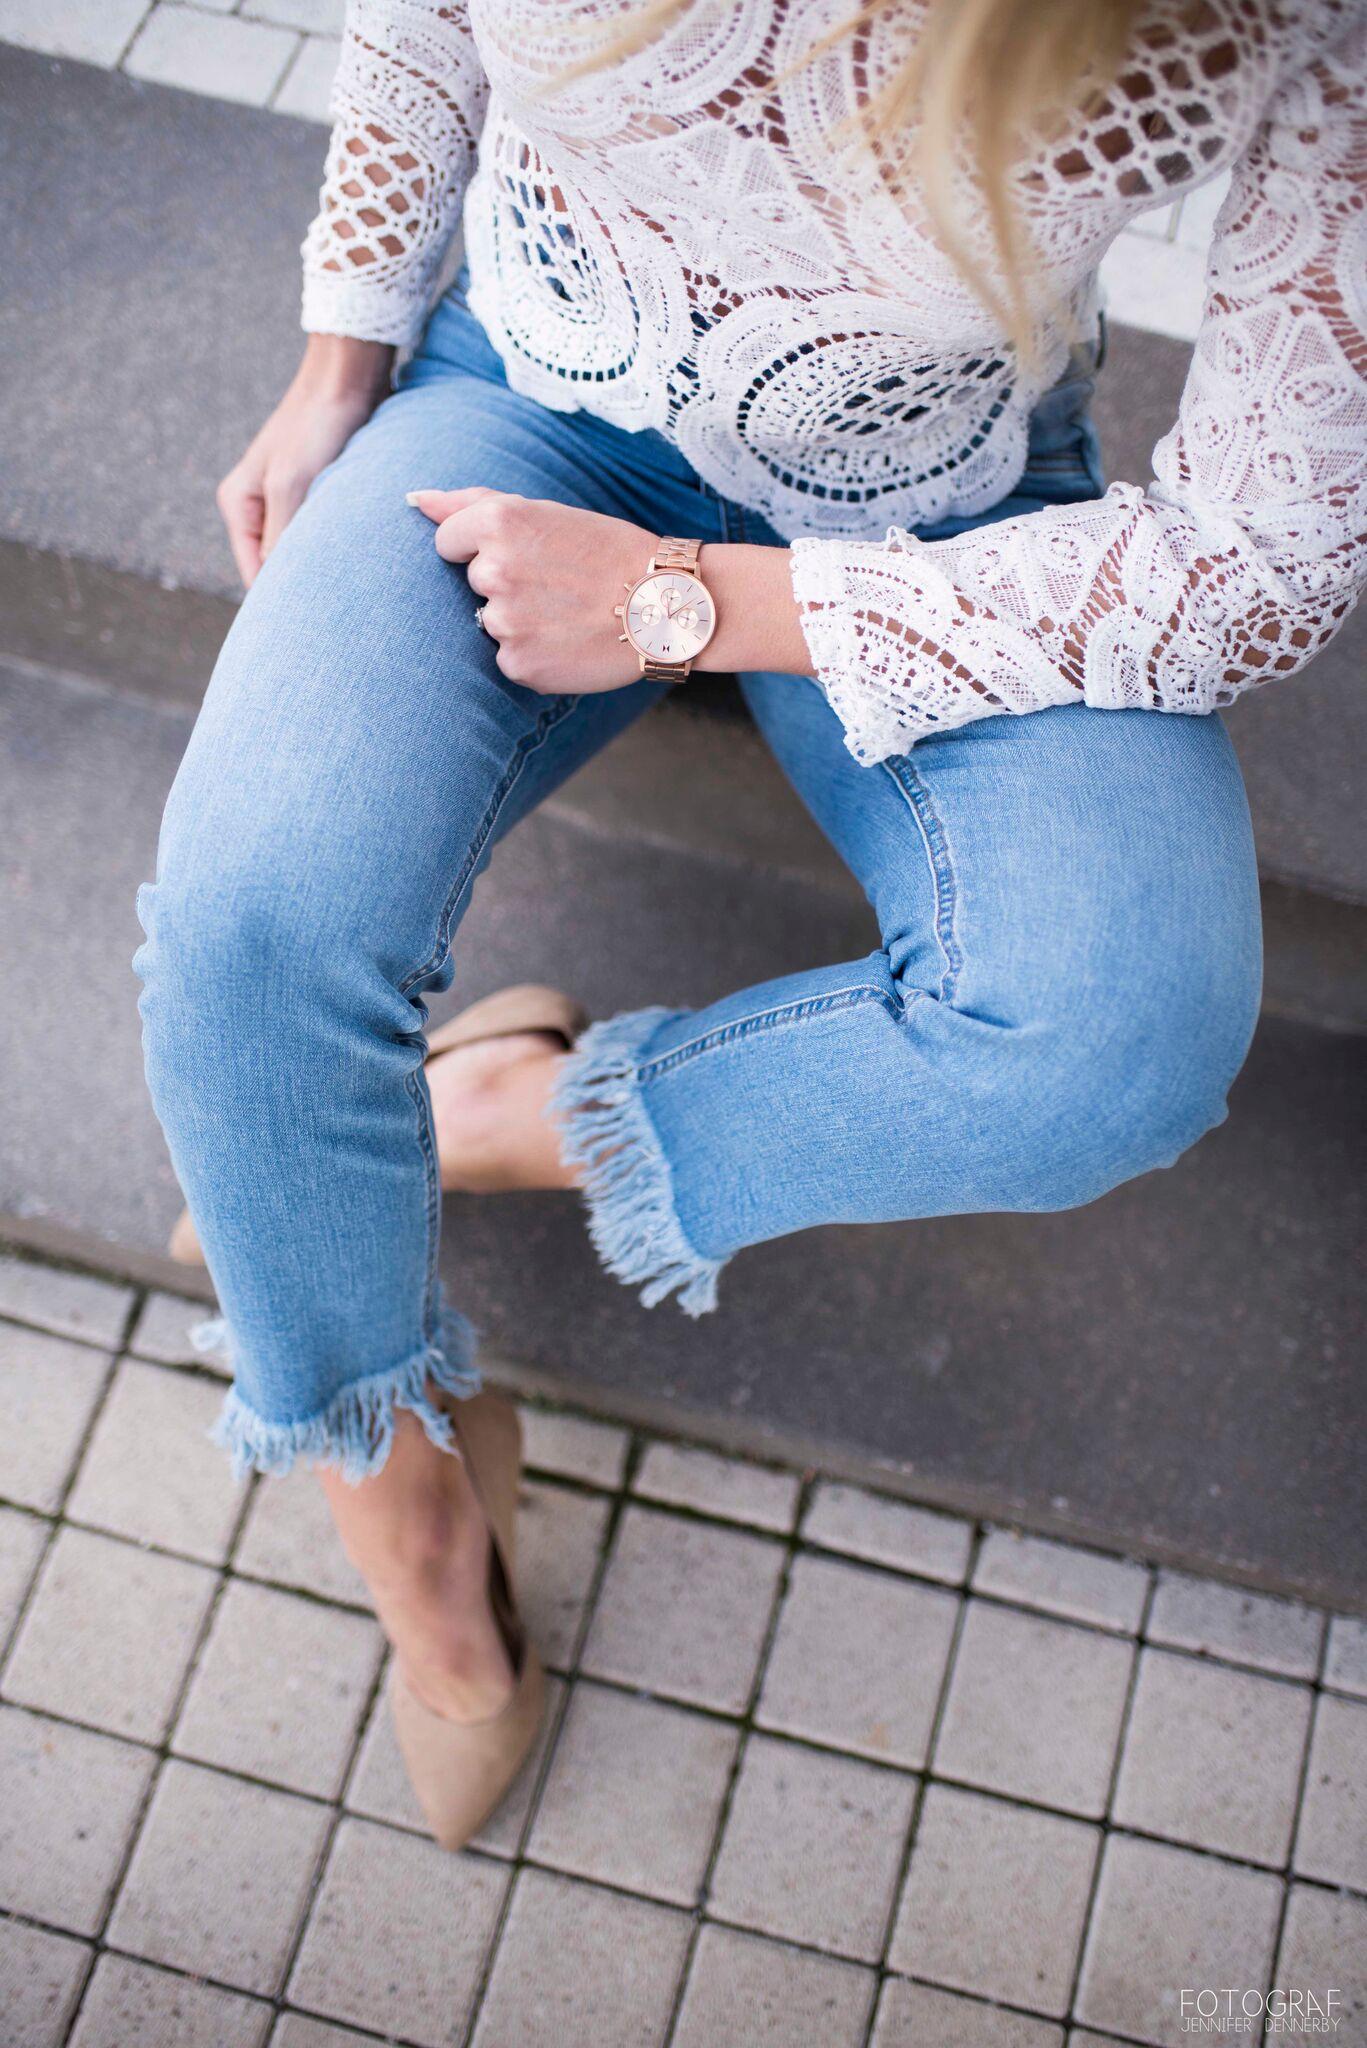 Tawna fashion photo stockholm mvmt white lace high heels